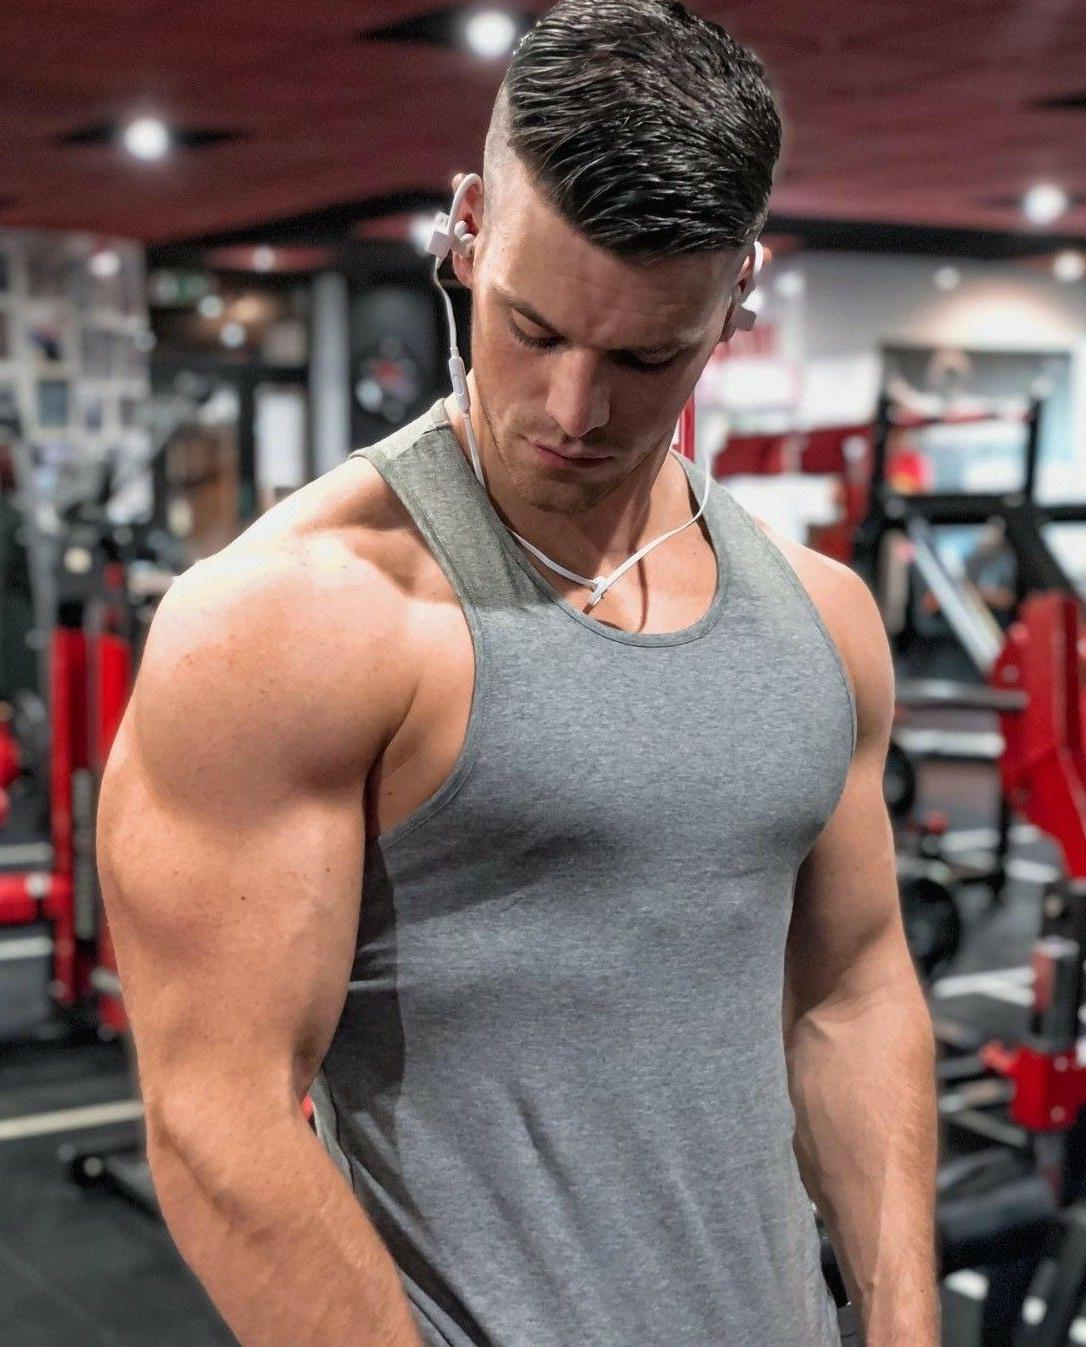 classic-sexy-gym-bro-big-biceps-young-hunk